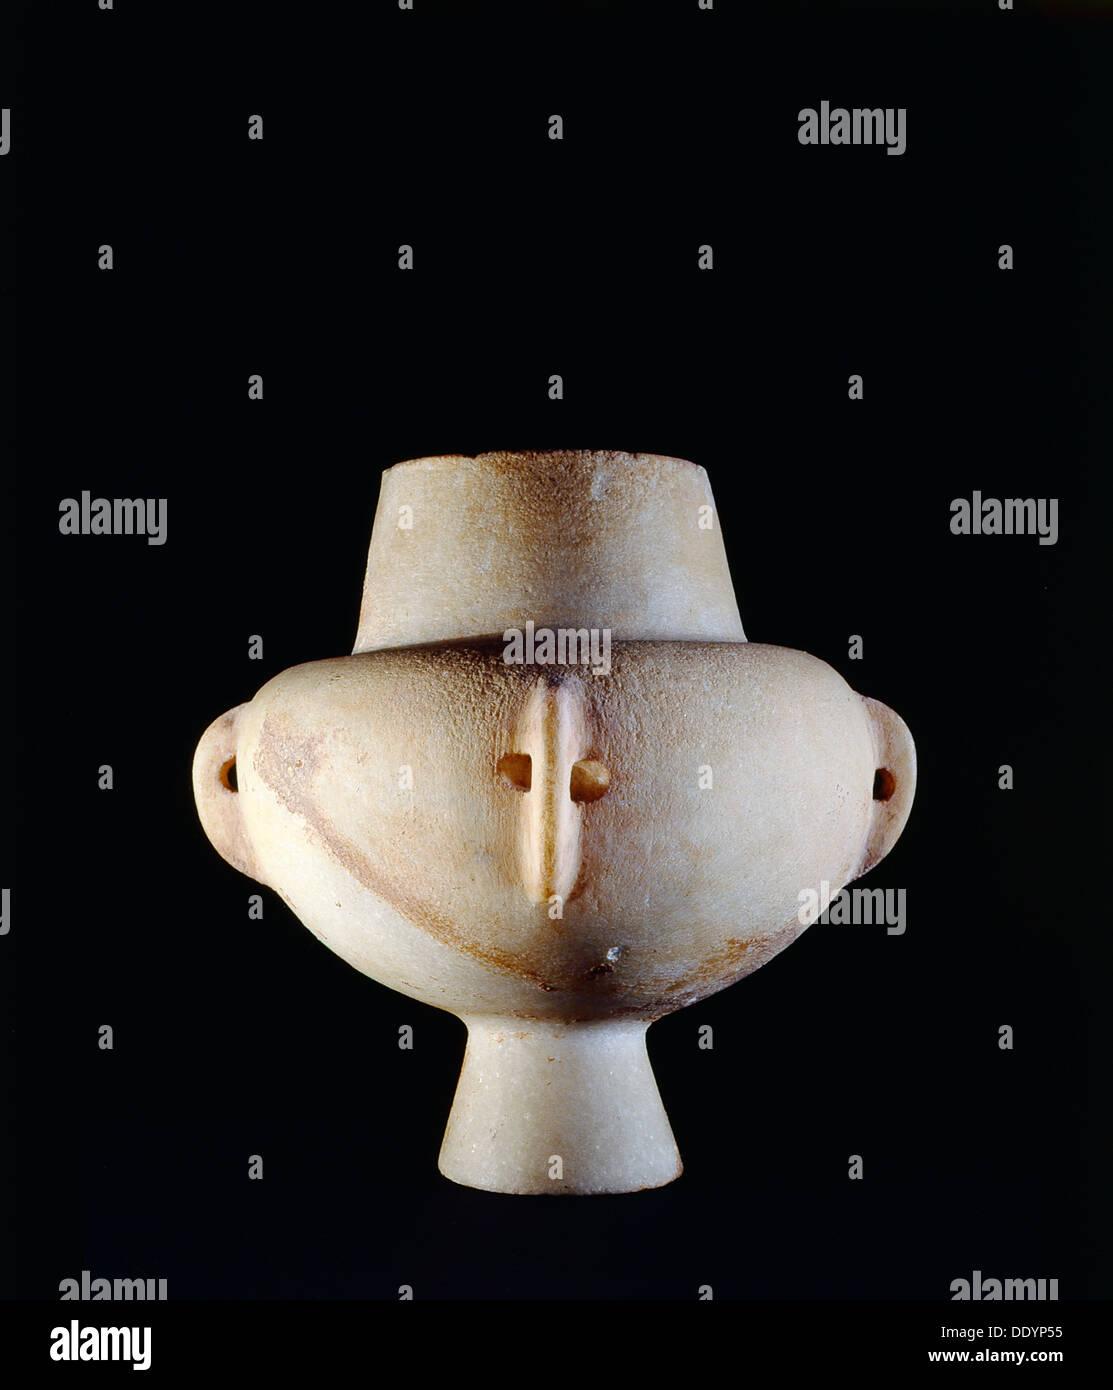 Ancient Greek Cycladic vessel, c3200-2800 BC. Artist: Werner Forman - Stock Image